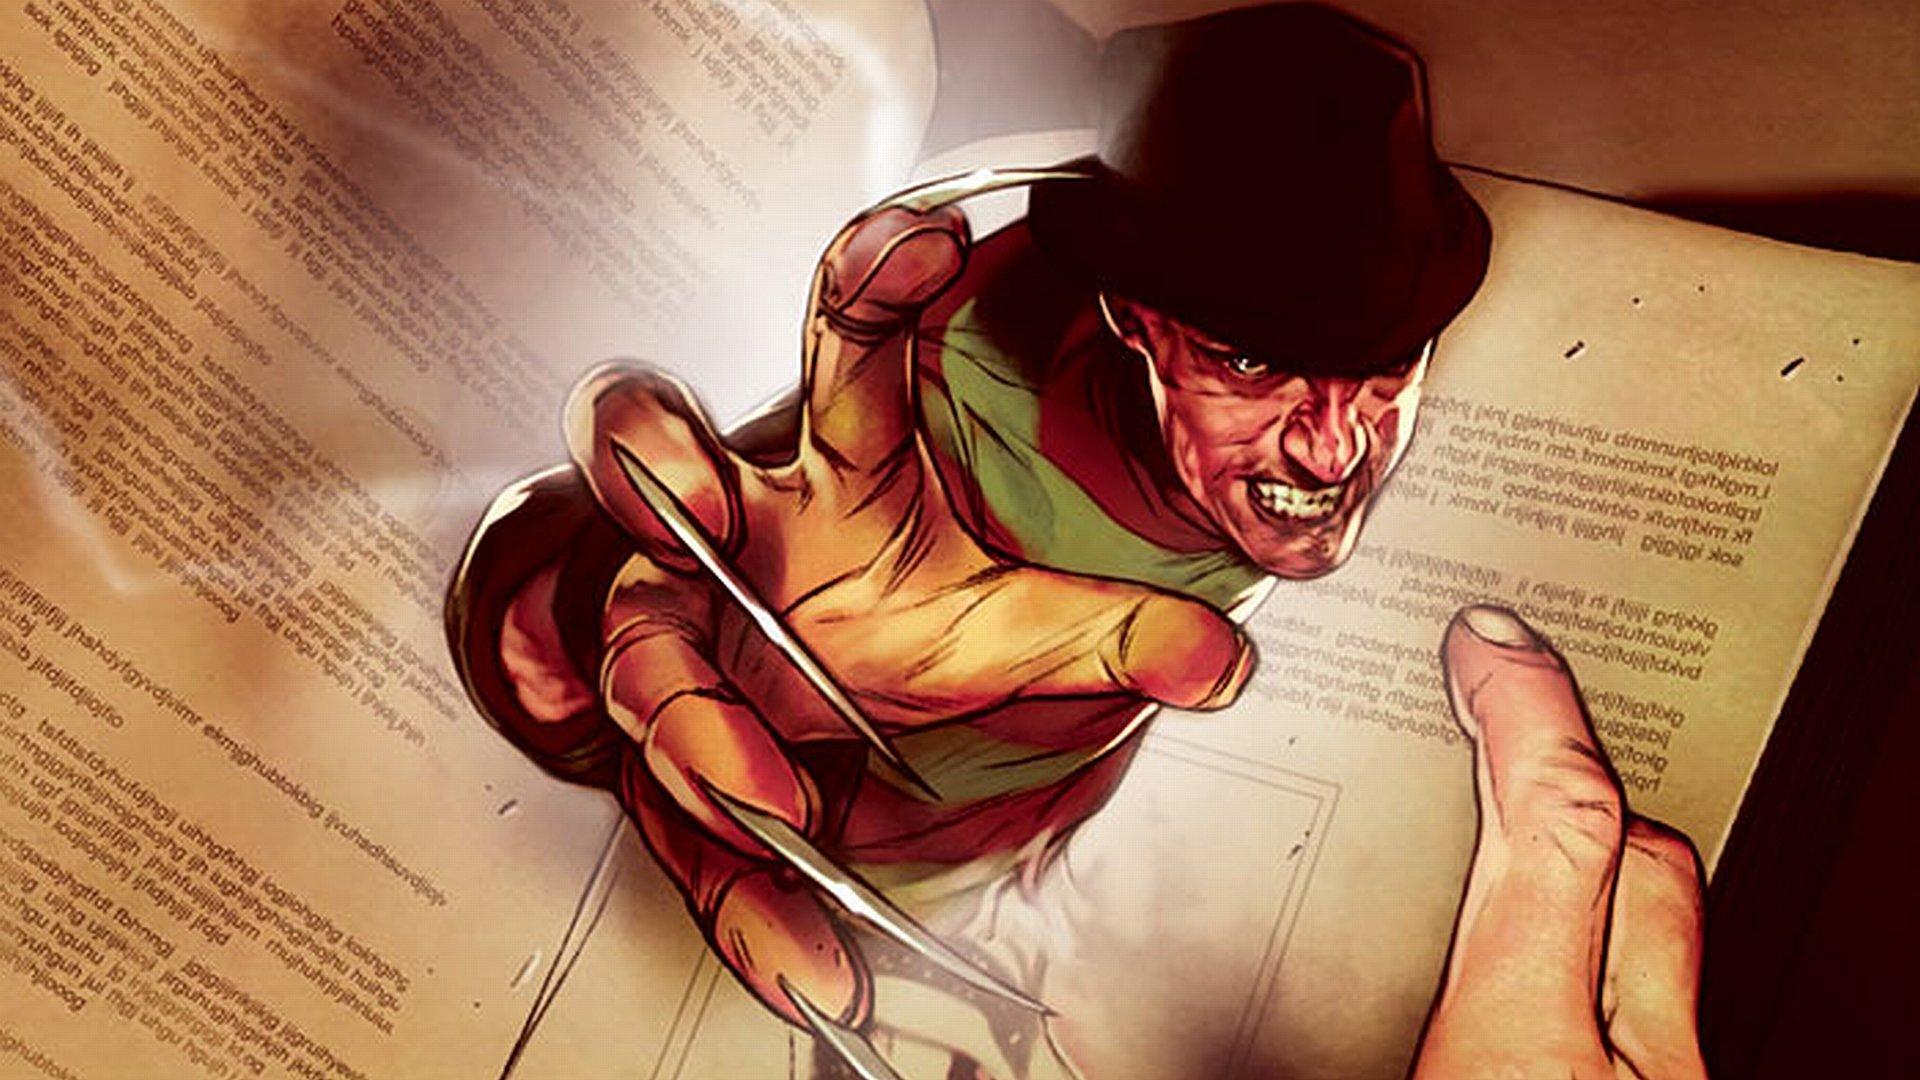 High Resolution A Nightmare On Elm Street Full Hd 1920x1080 Wallpaper ID465757 For Desktop